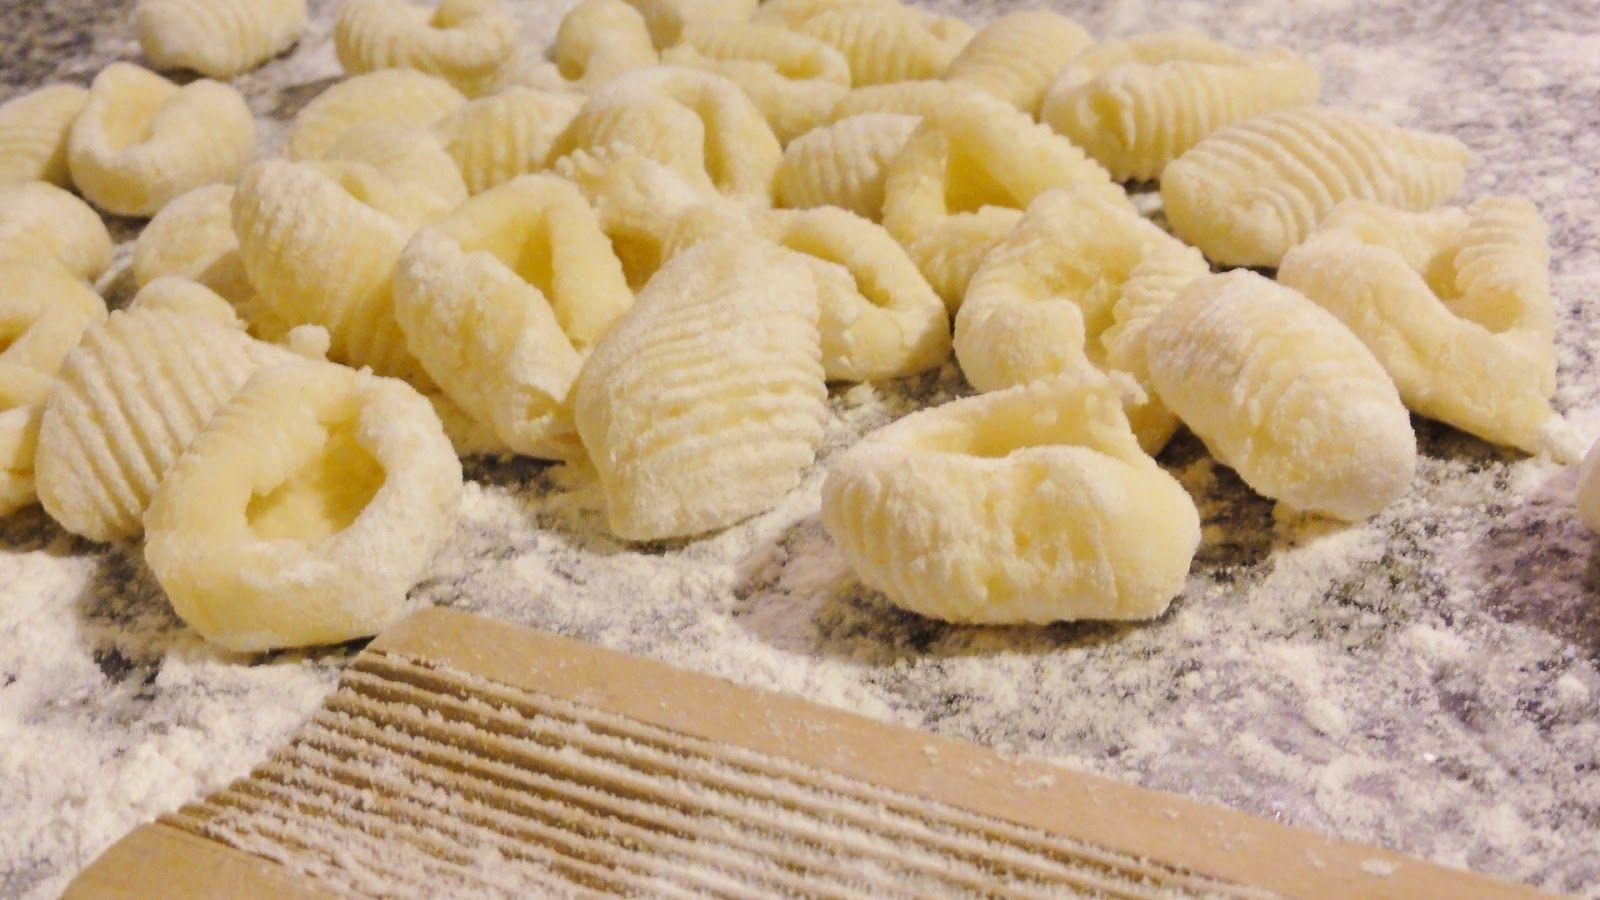 Recetas de ñoquis para este 29: de papa, ricota y hasta de zanahoria